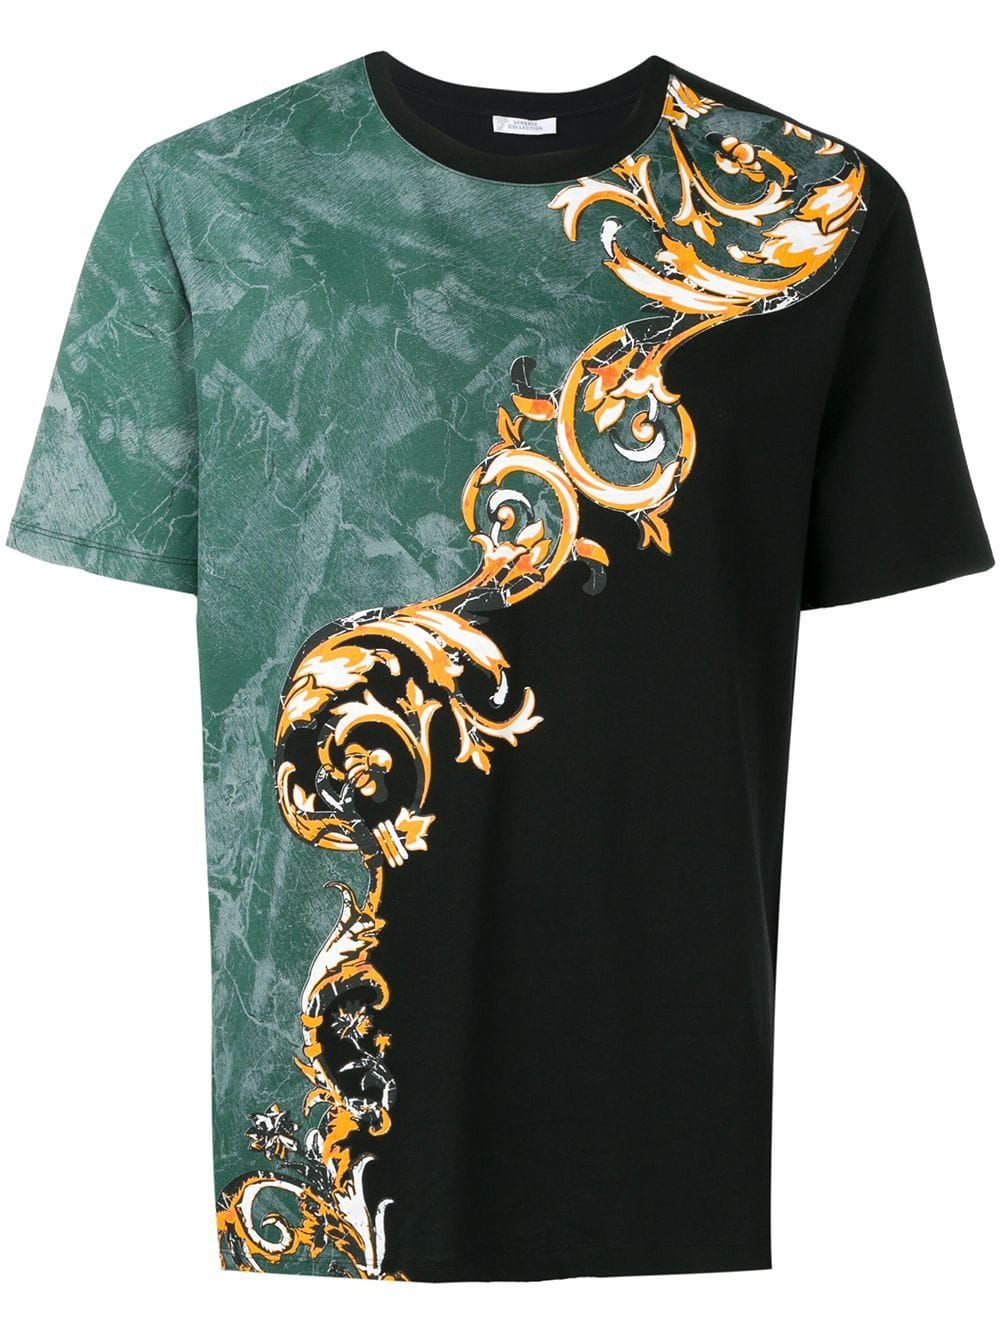 55a53179c888 VERSACE VERSACE COLLECTION COLOURBLOCK MARBLED BAROQUE T-SHIRT - BLACK. # versace #cloth